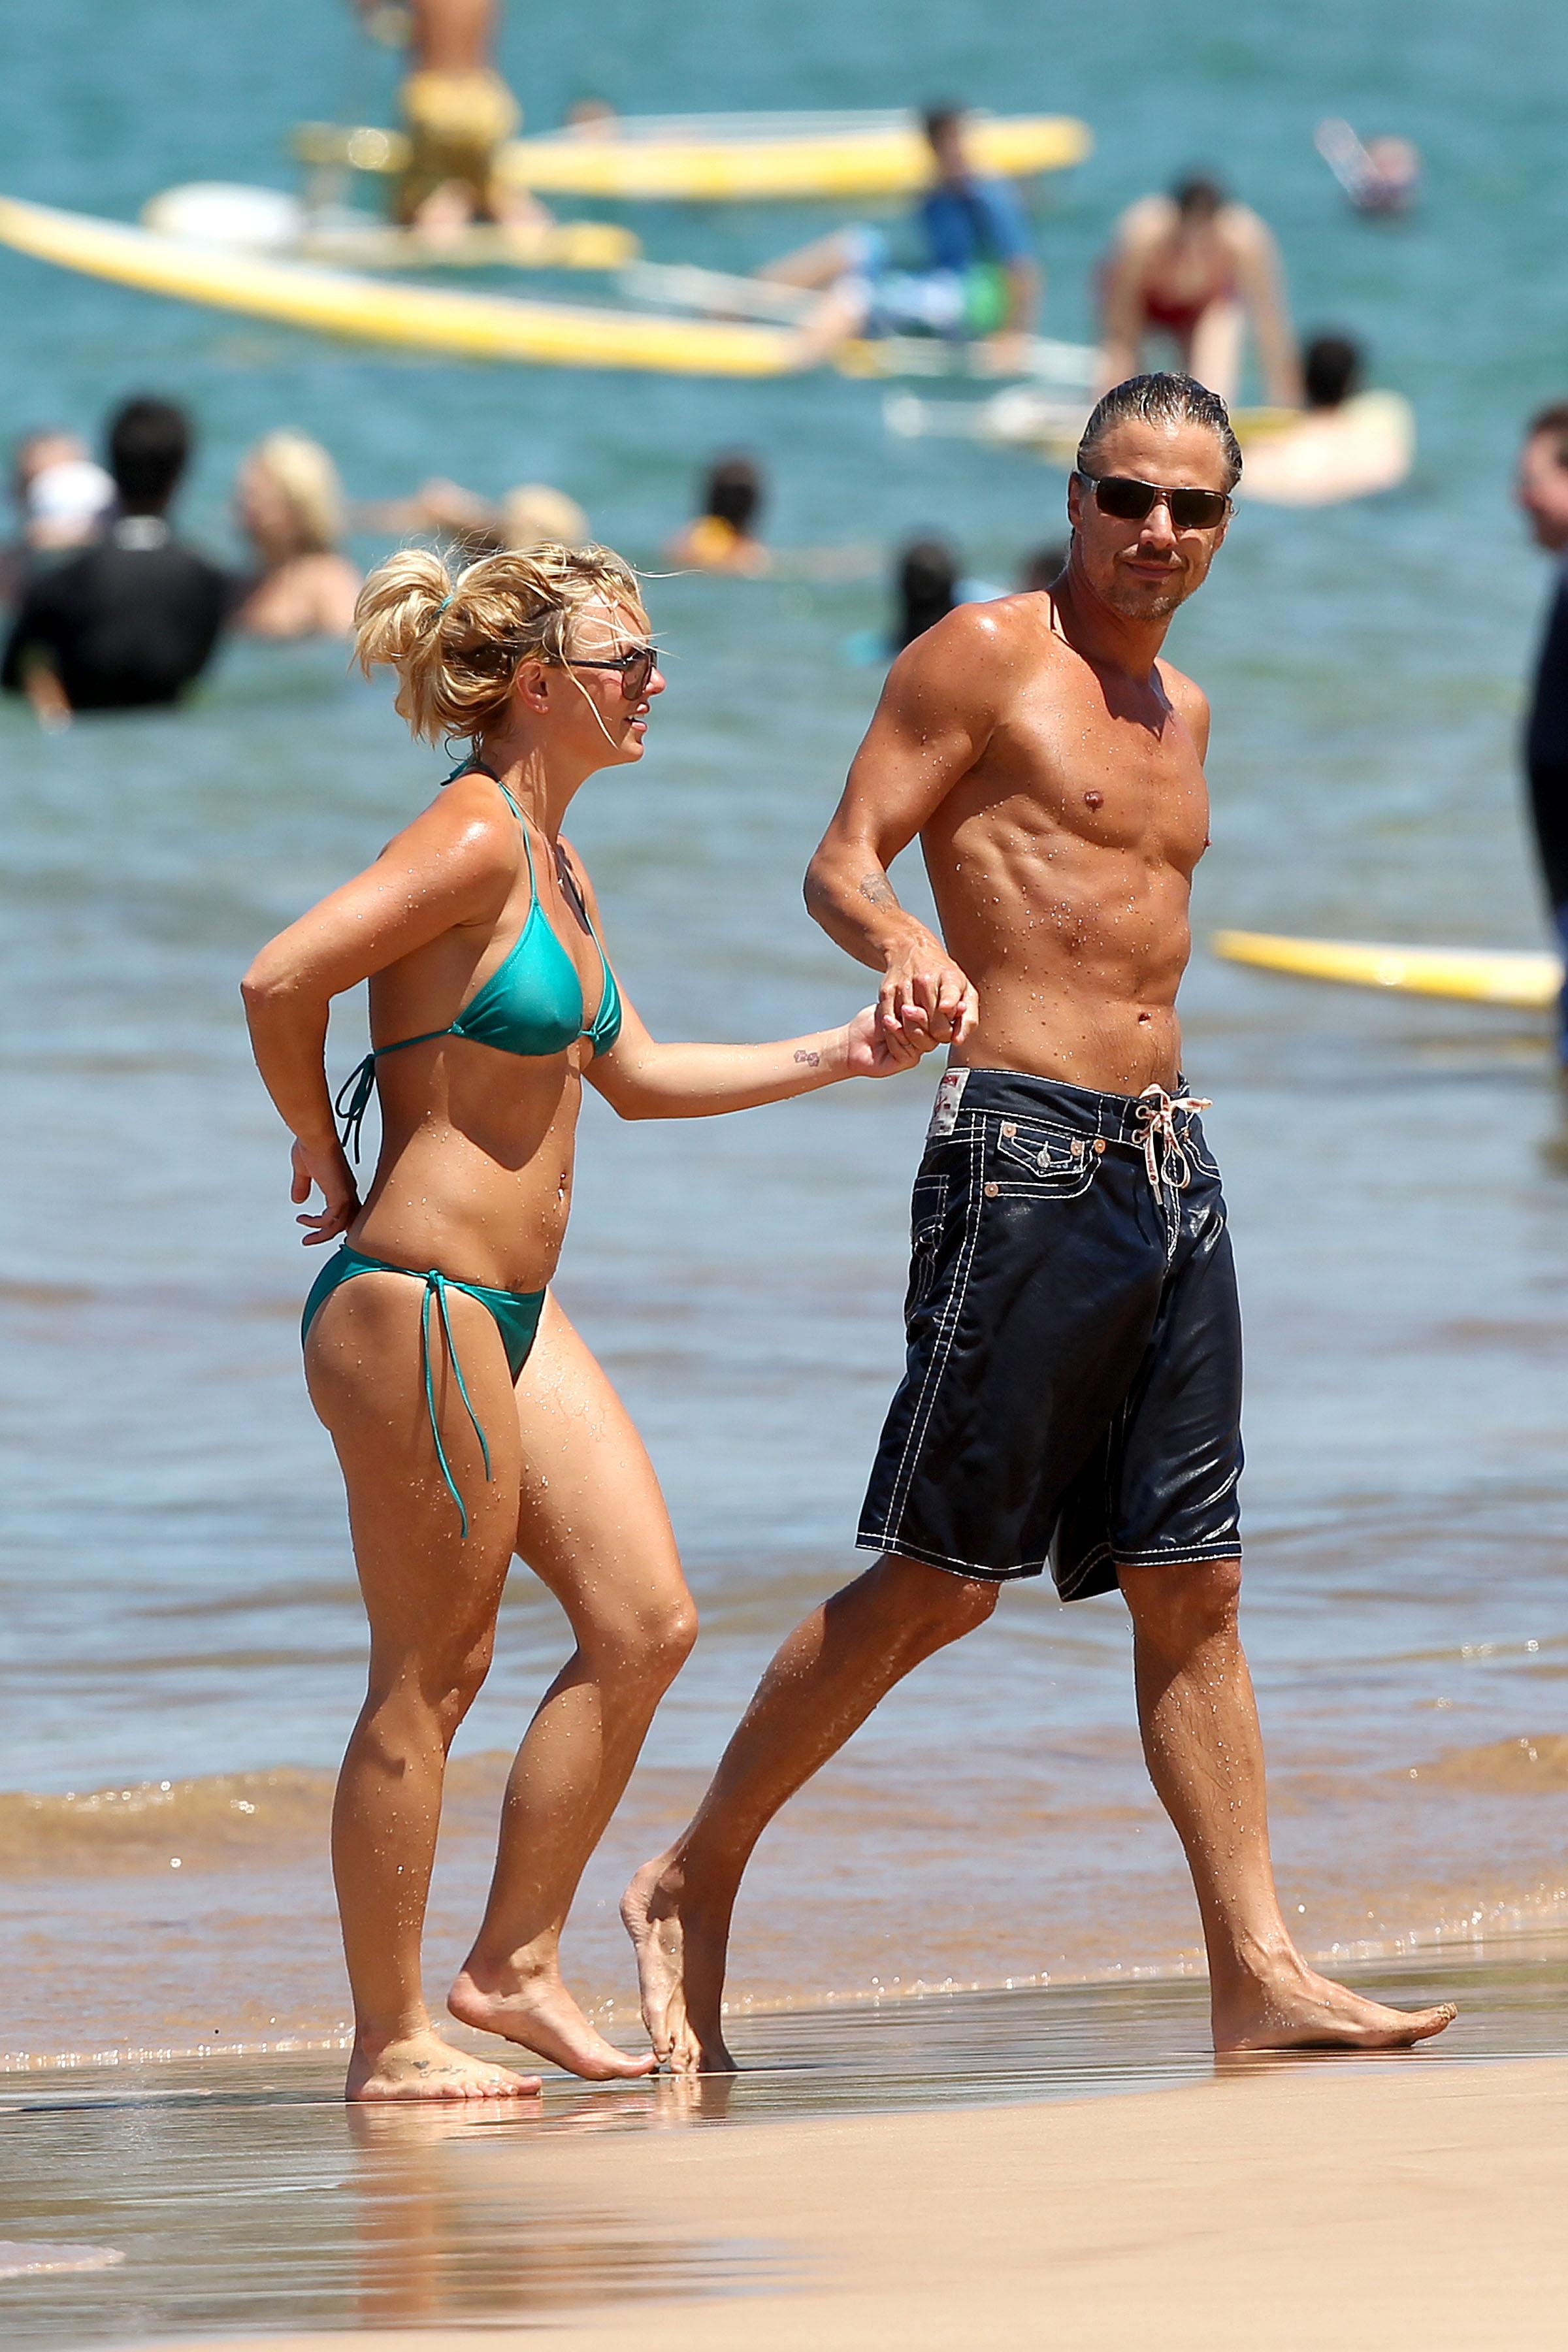 21746_Britney_Spears_on_the_beach_in_Maui_13_122_100lo.jpg